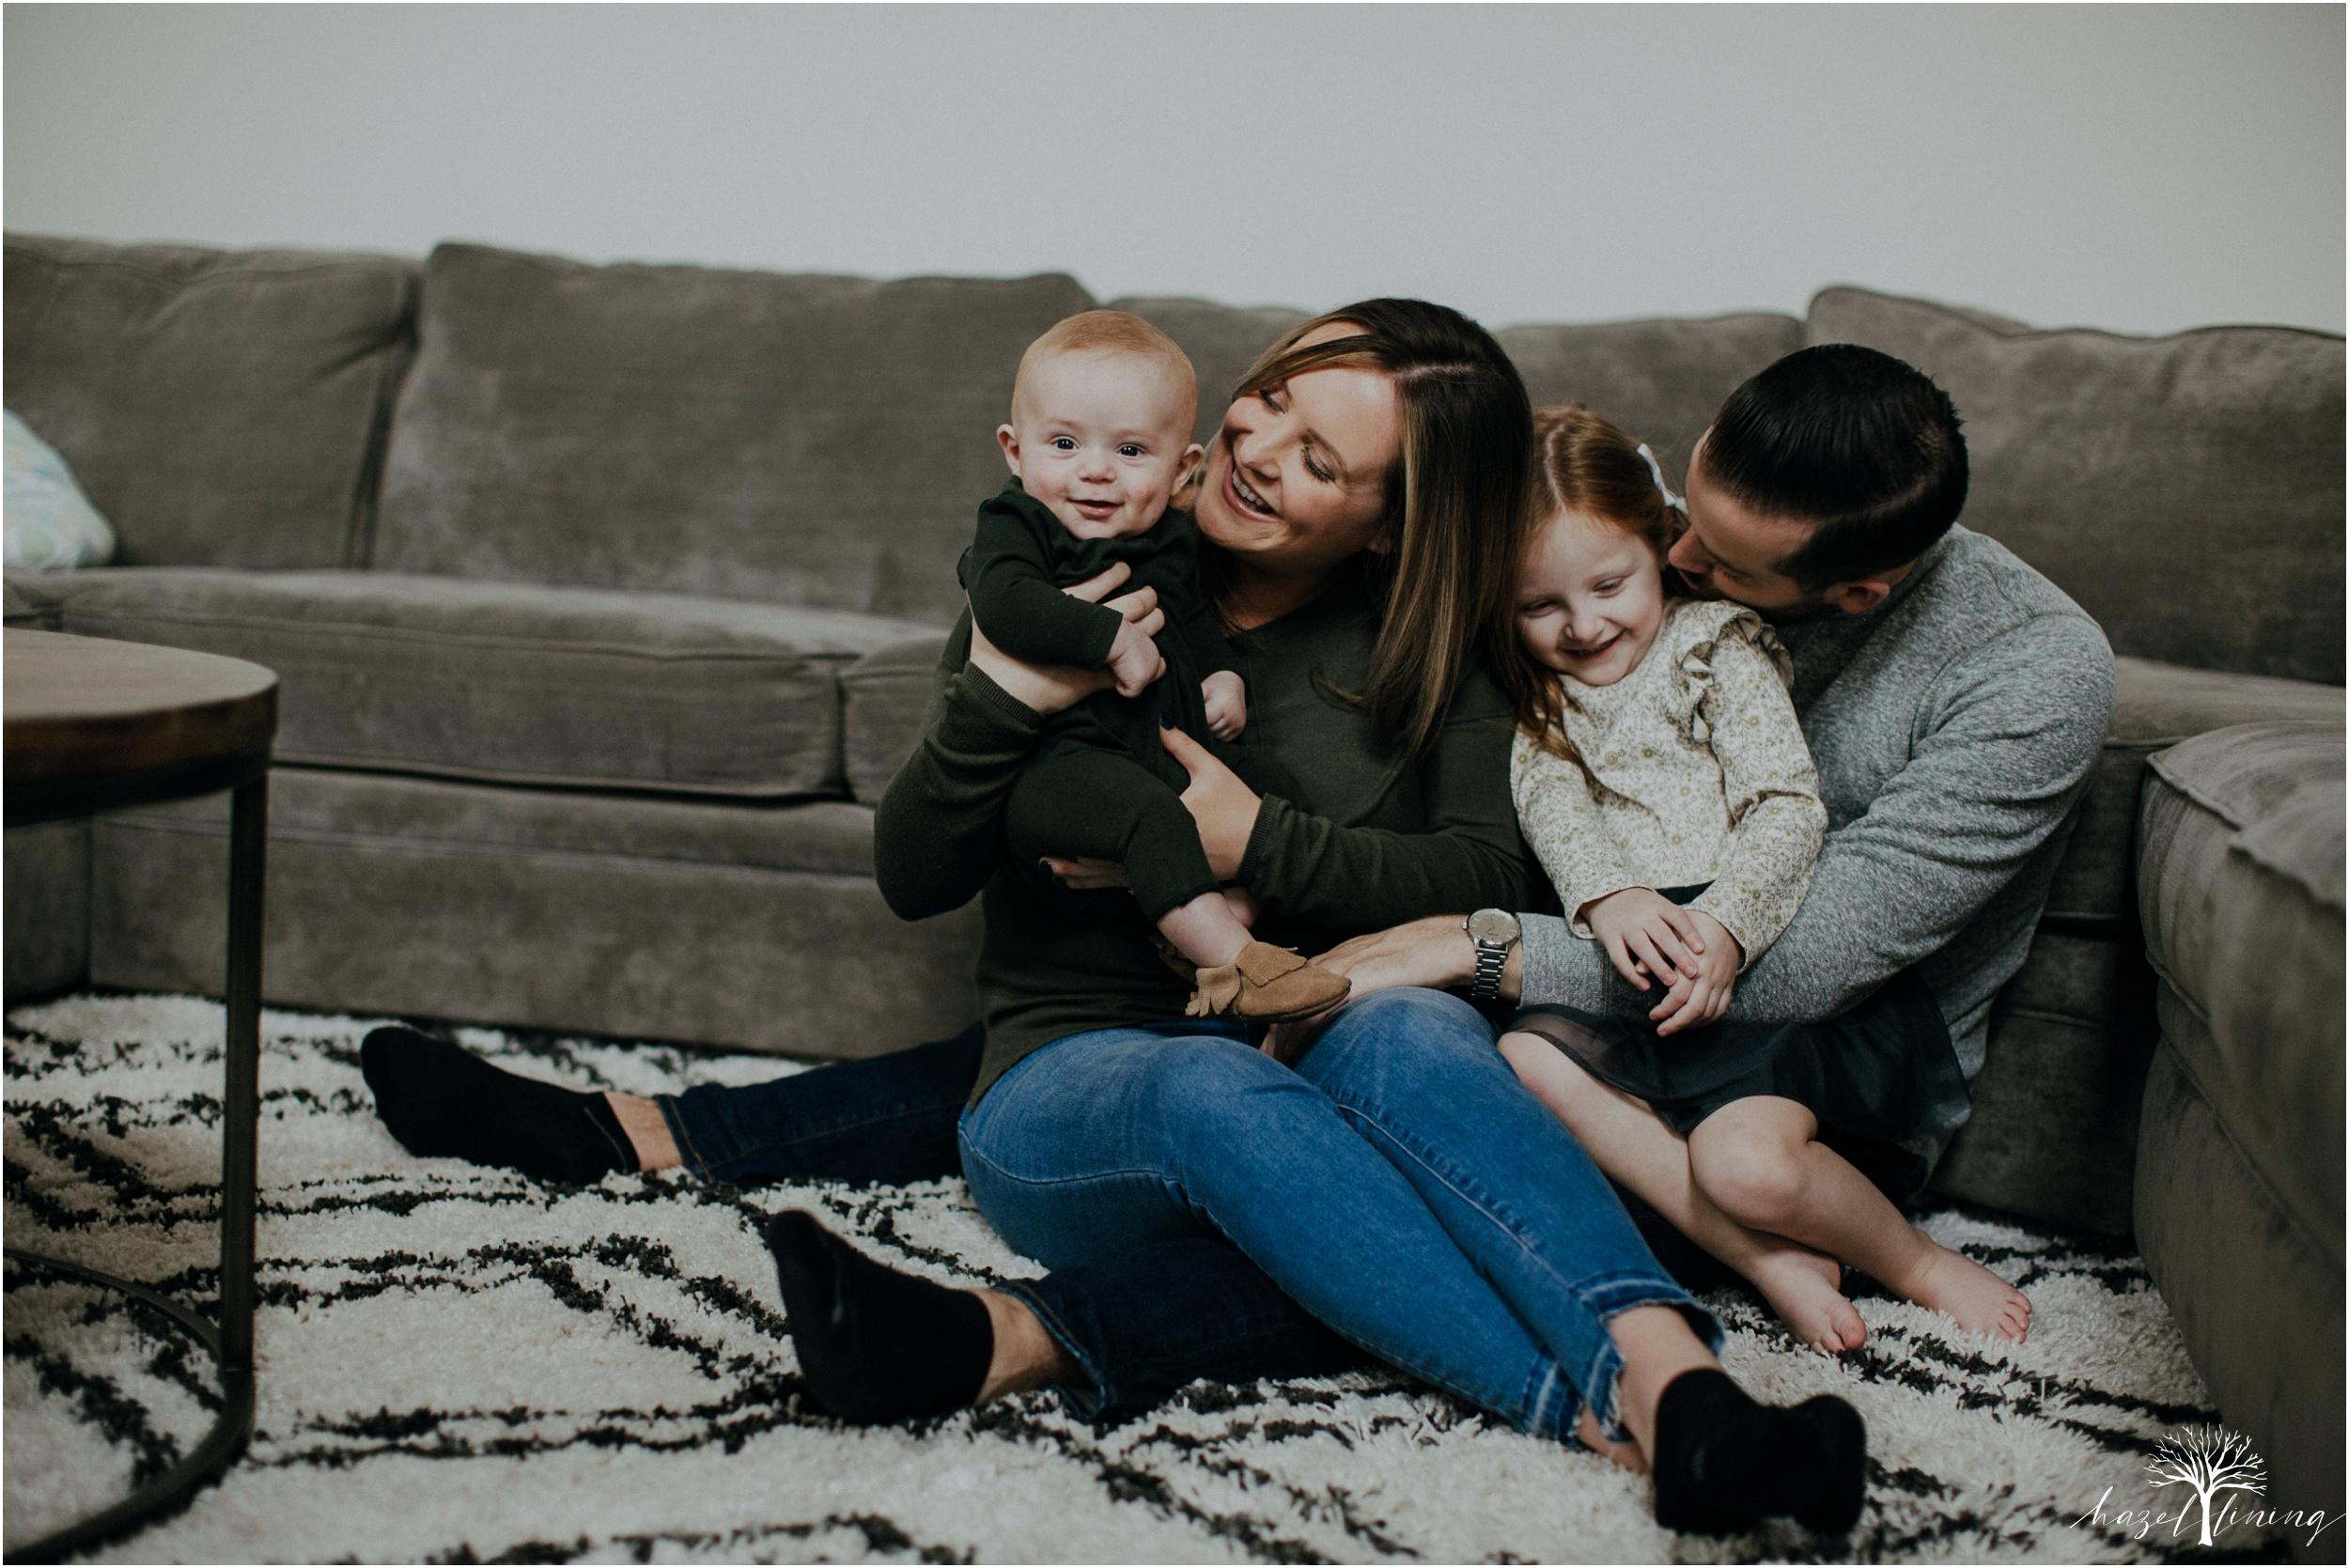 pellgrino-family-in-home-lifestyle-family-portraits_0043.jpg